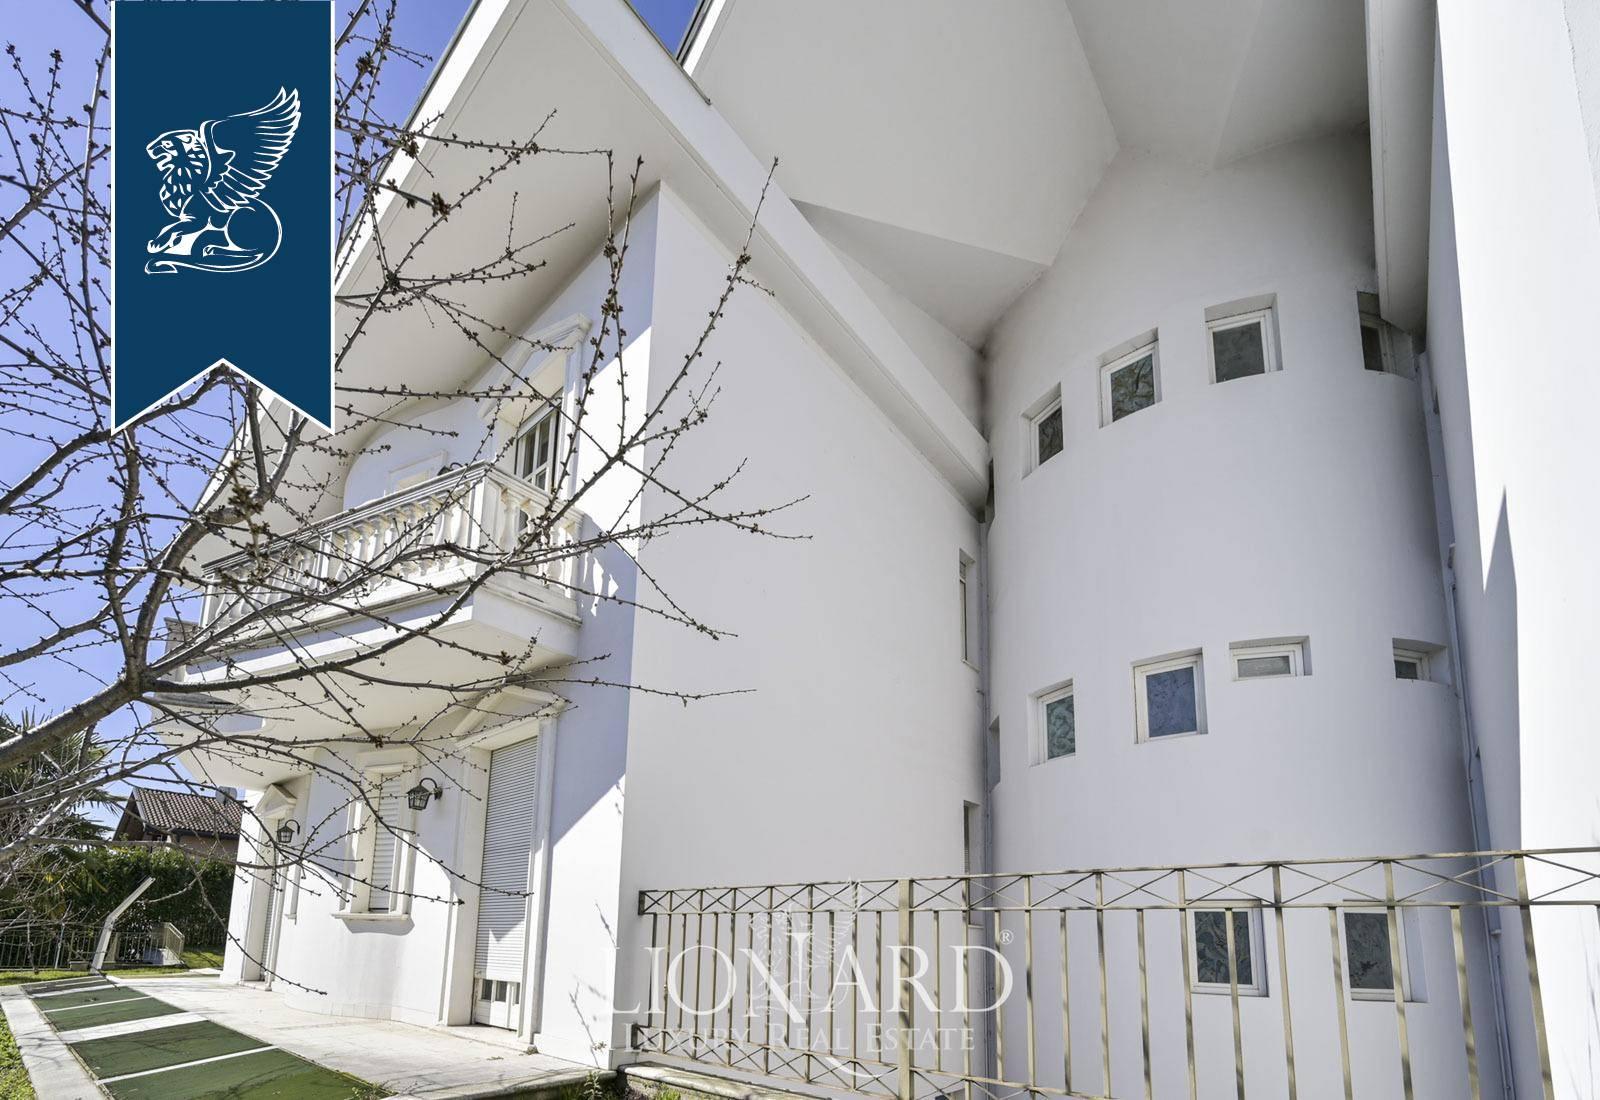 Villa in Vendita a Lainate: 0 locali, 1284 mq - Foto 7